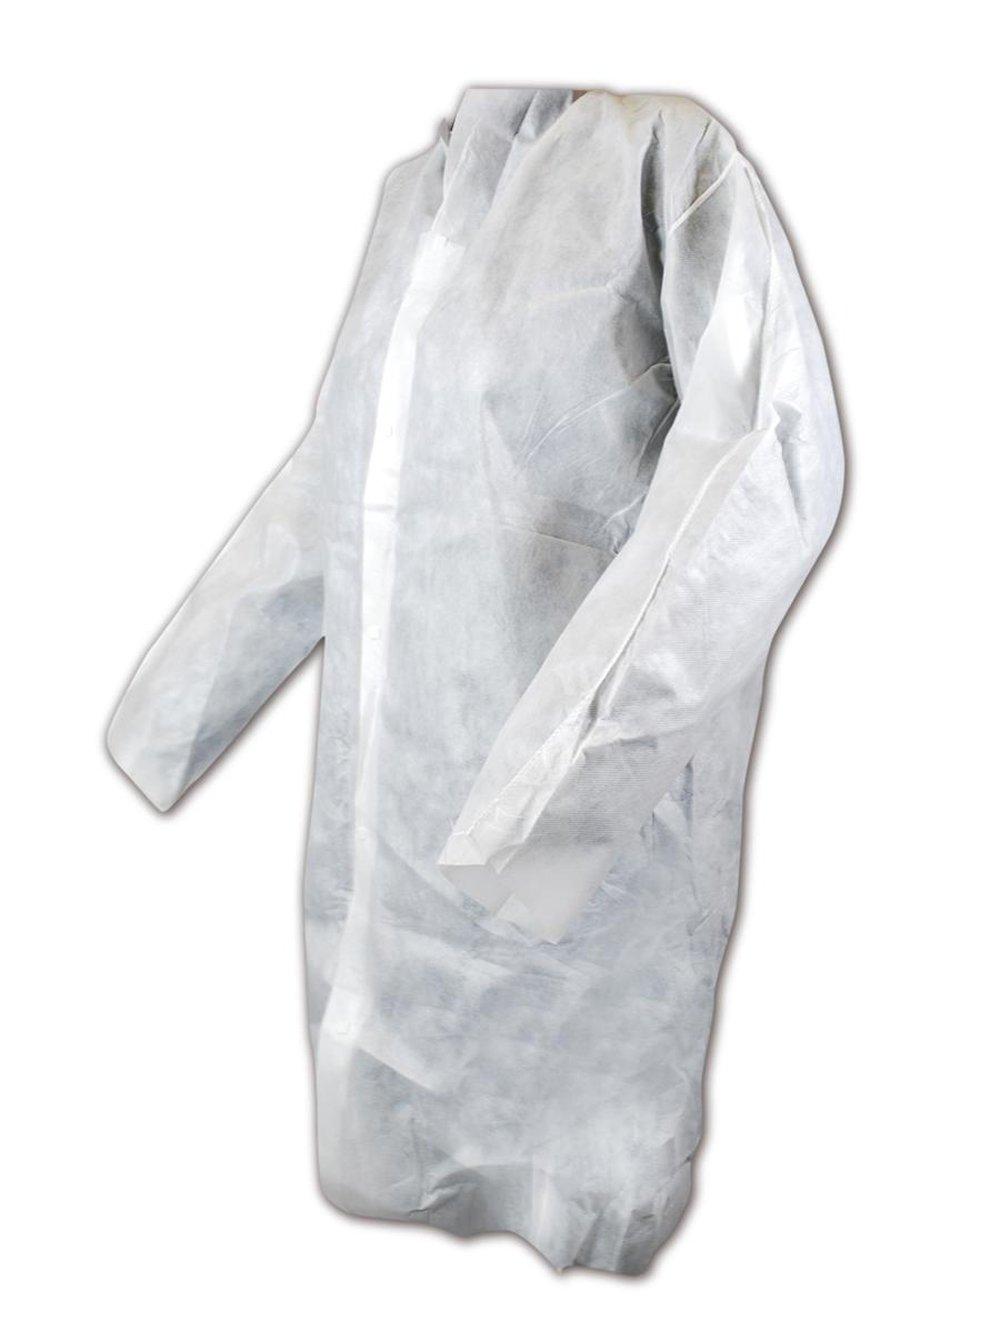 3 Disposable Polyethylene Apron Pack of 100 Magid Glove /& Safety DA2845W Magid EconoWear White 28 x 45 2 Mil Blue 28x45